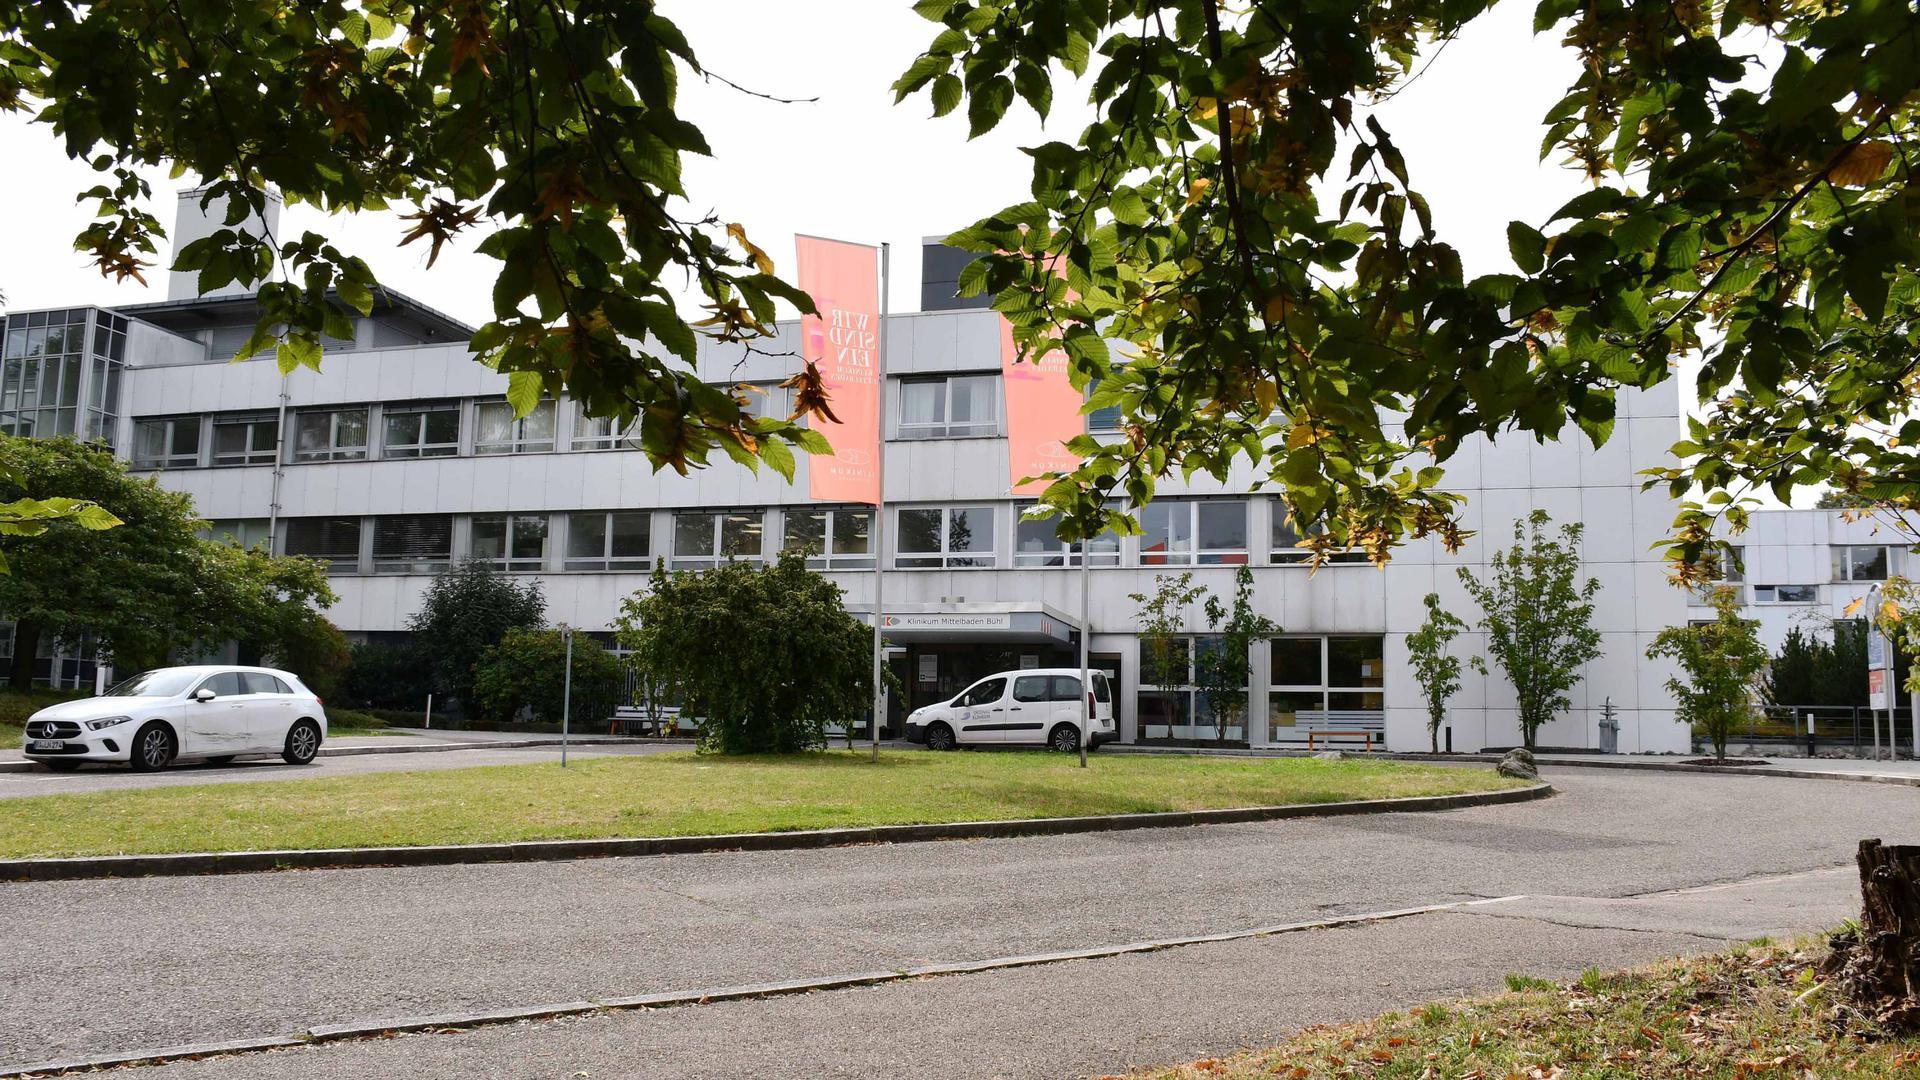 Krankenhaus Bühl Klinikum Mittelbaden Bühl